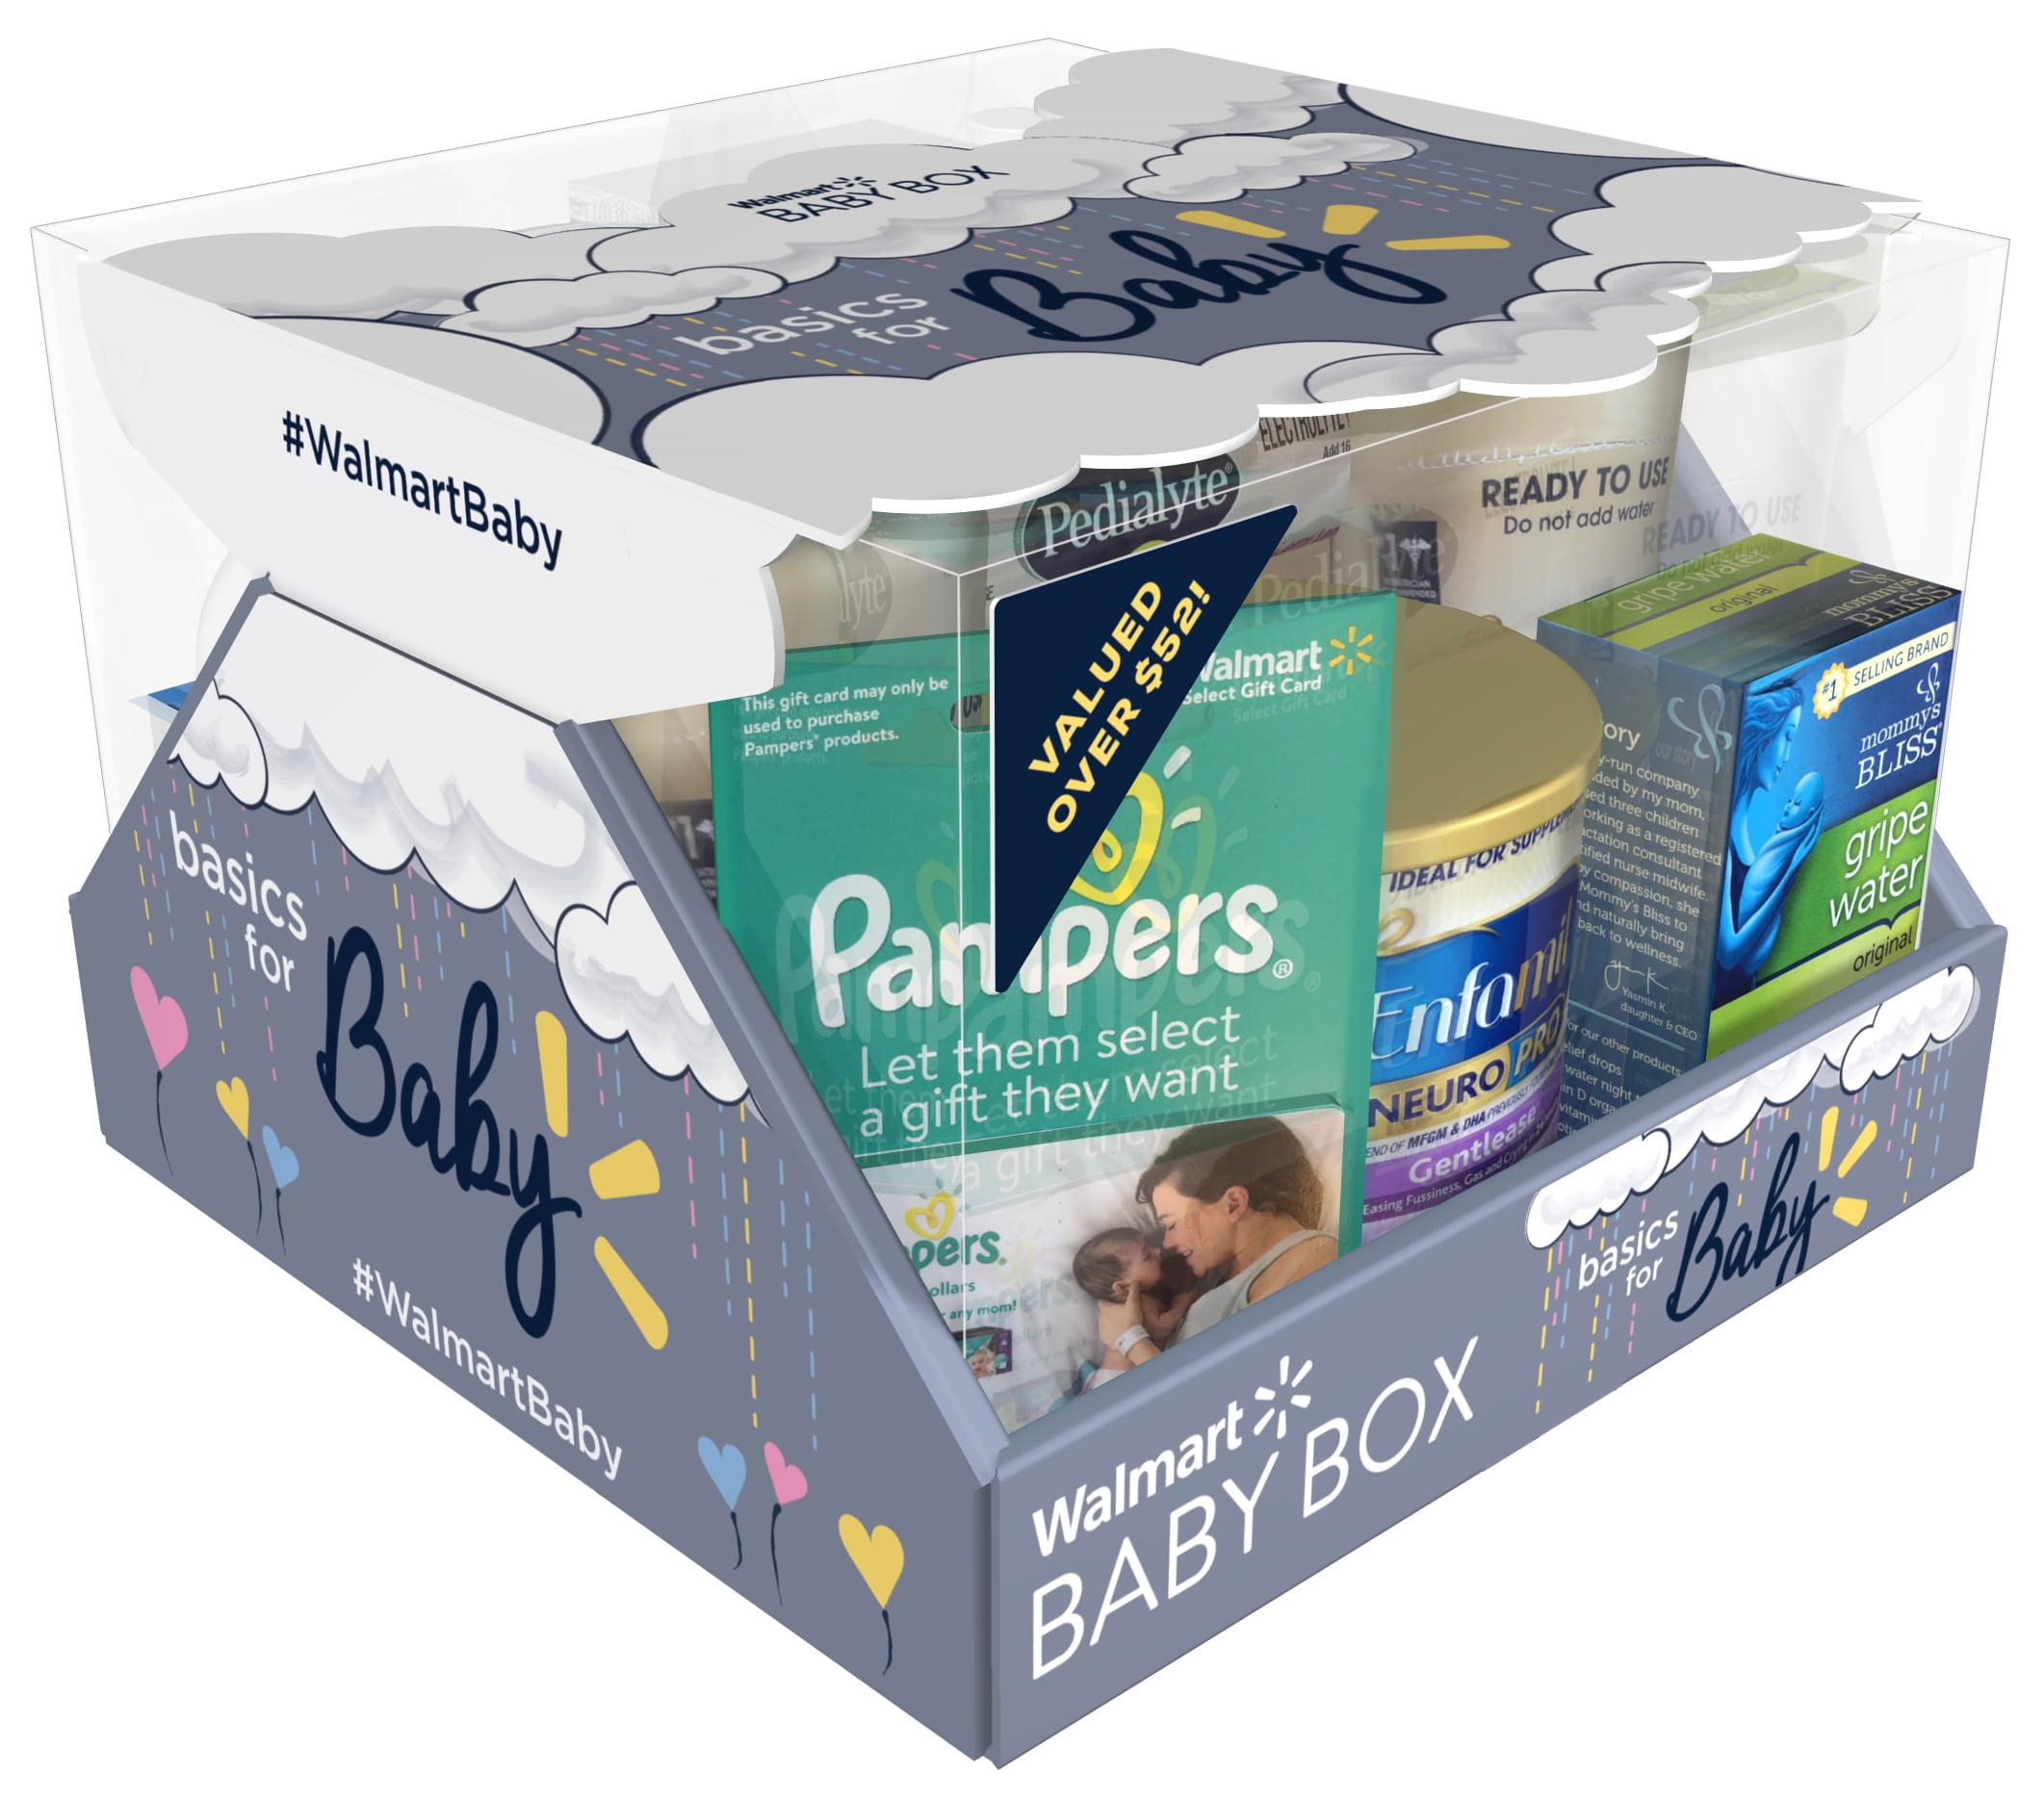 Walmart's Baby Favorites Box - $52 VALUE